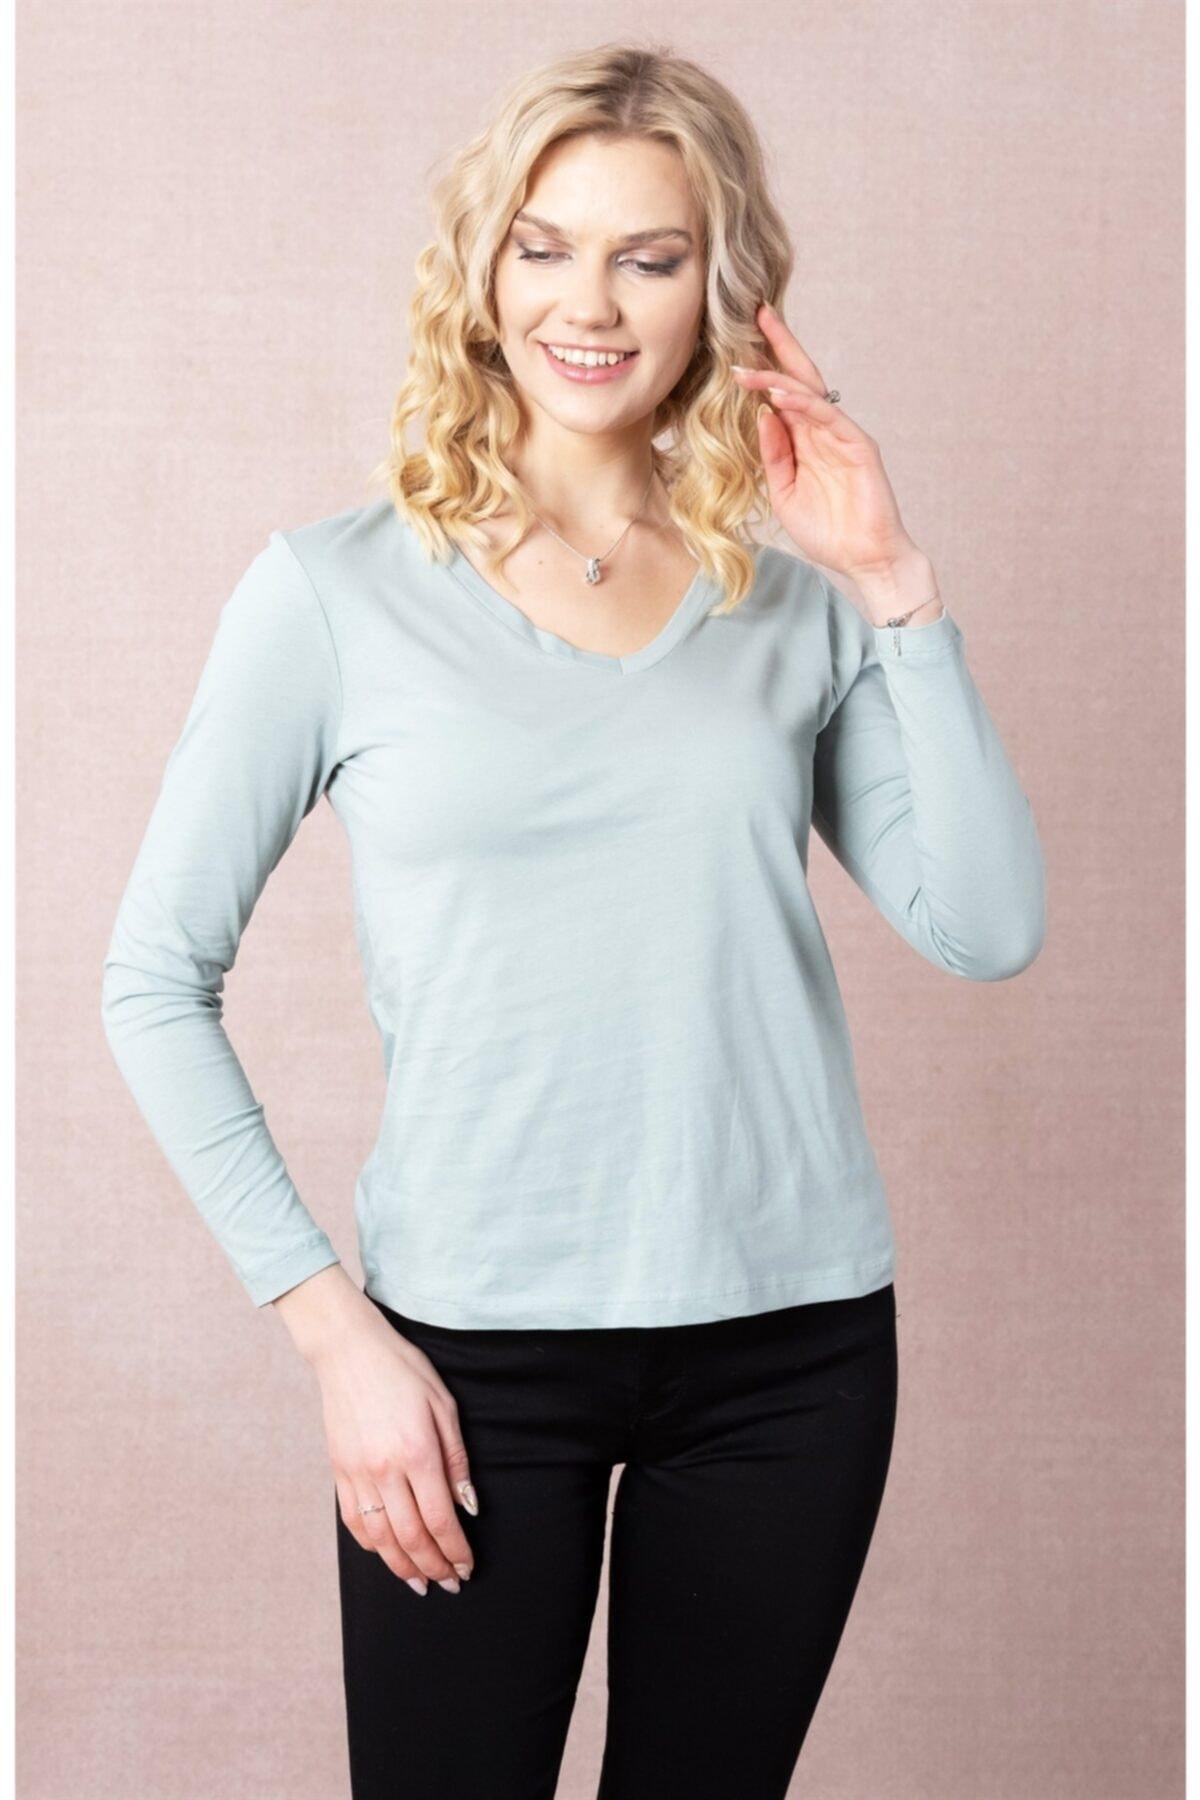 ESPİNA Kadın Yeşil V Yaka Kadın Uzun Kollu T-shirt